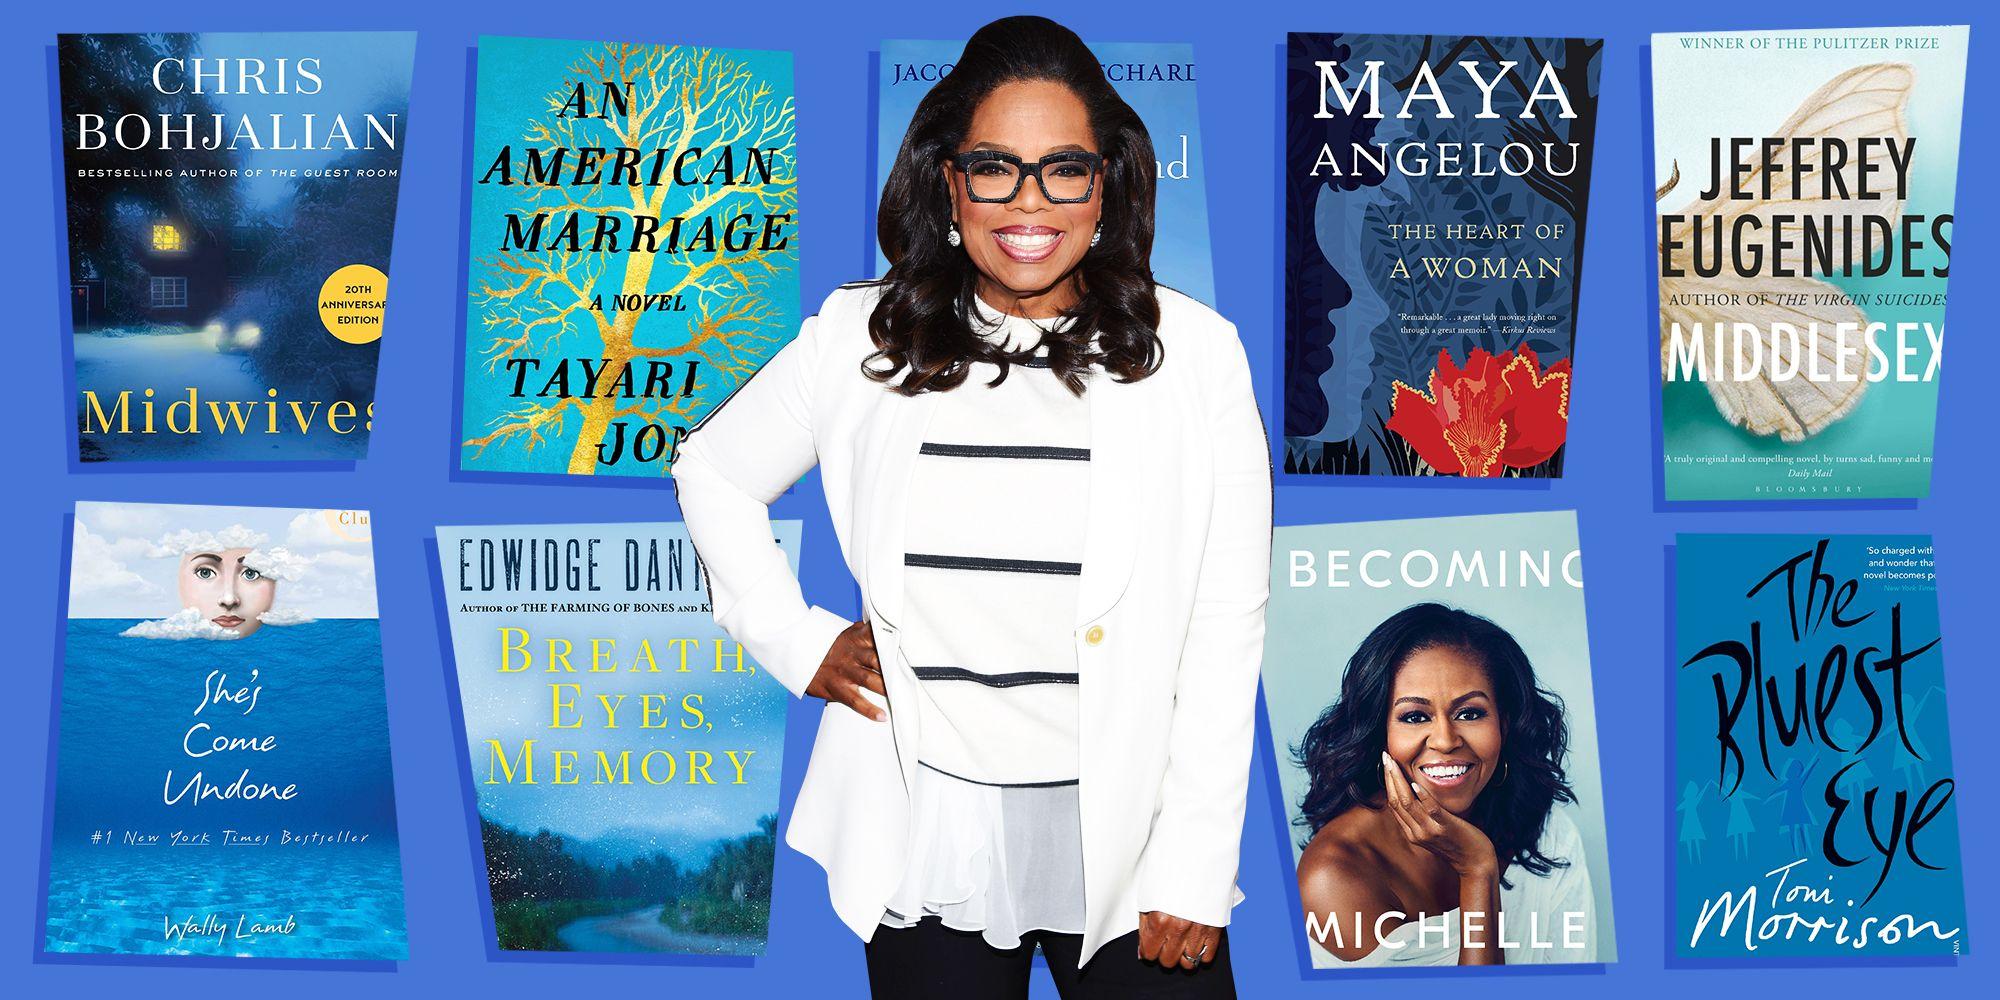 54 Best Books From Oprah's Book Club 2019 - Oprah's Favorite Books